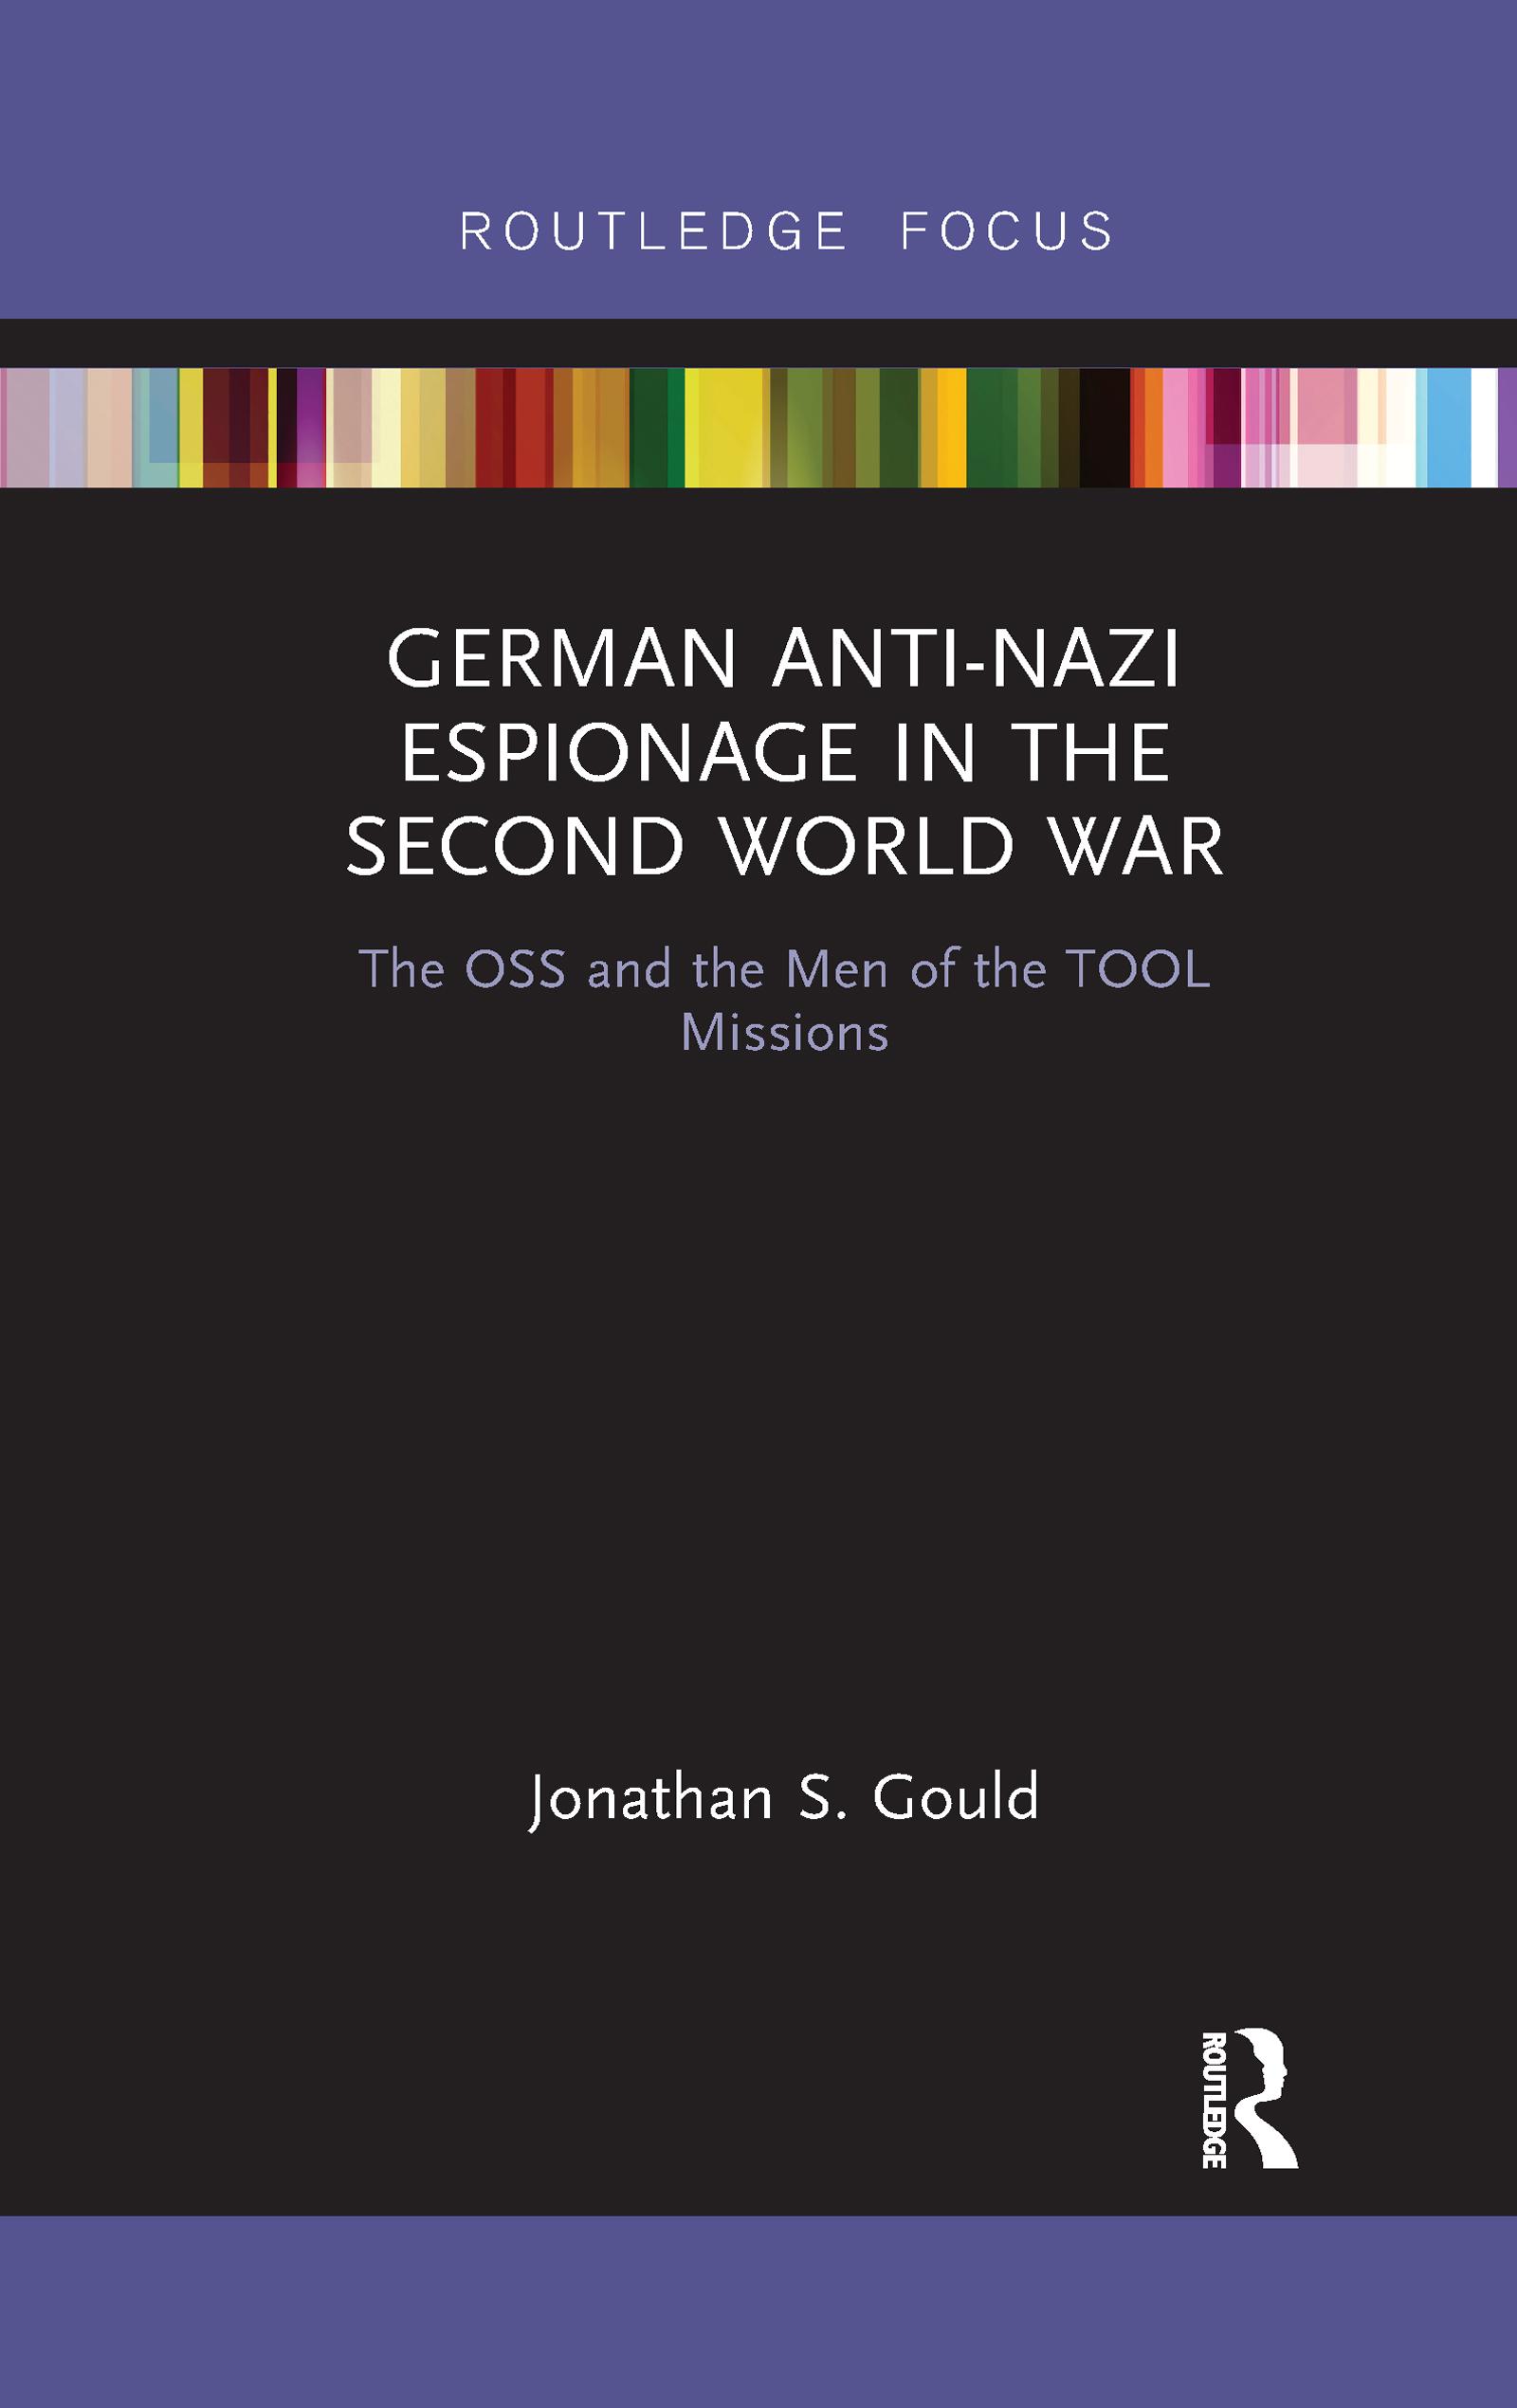 German Anti-Nazi Espionage in the Second World War